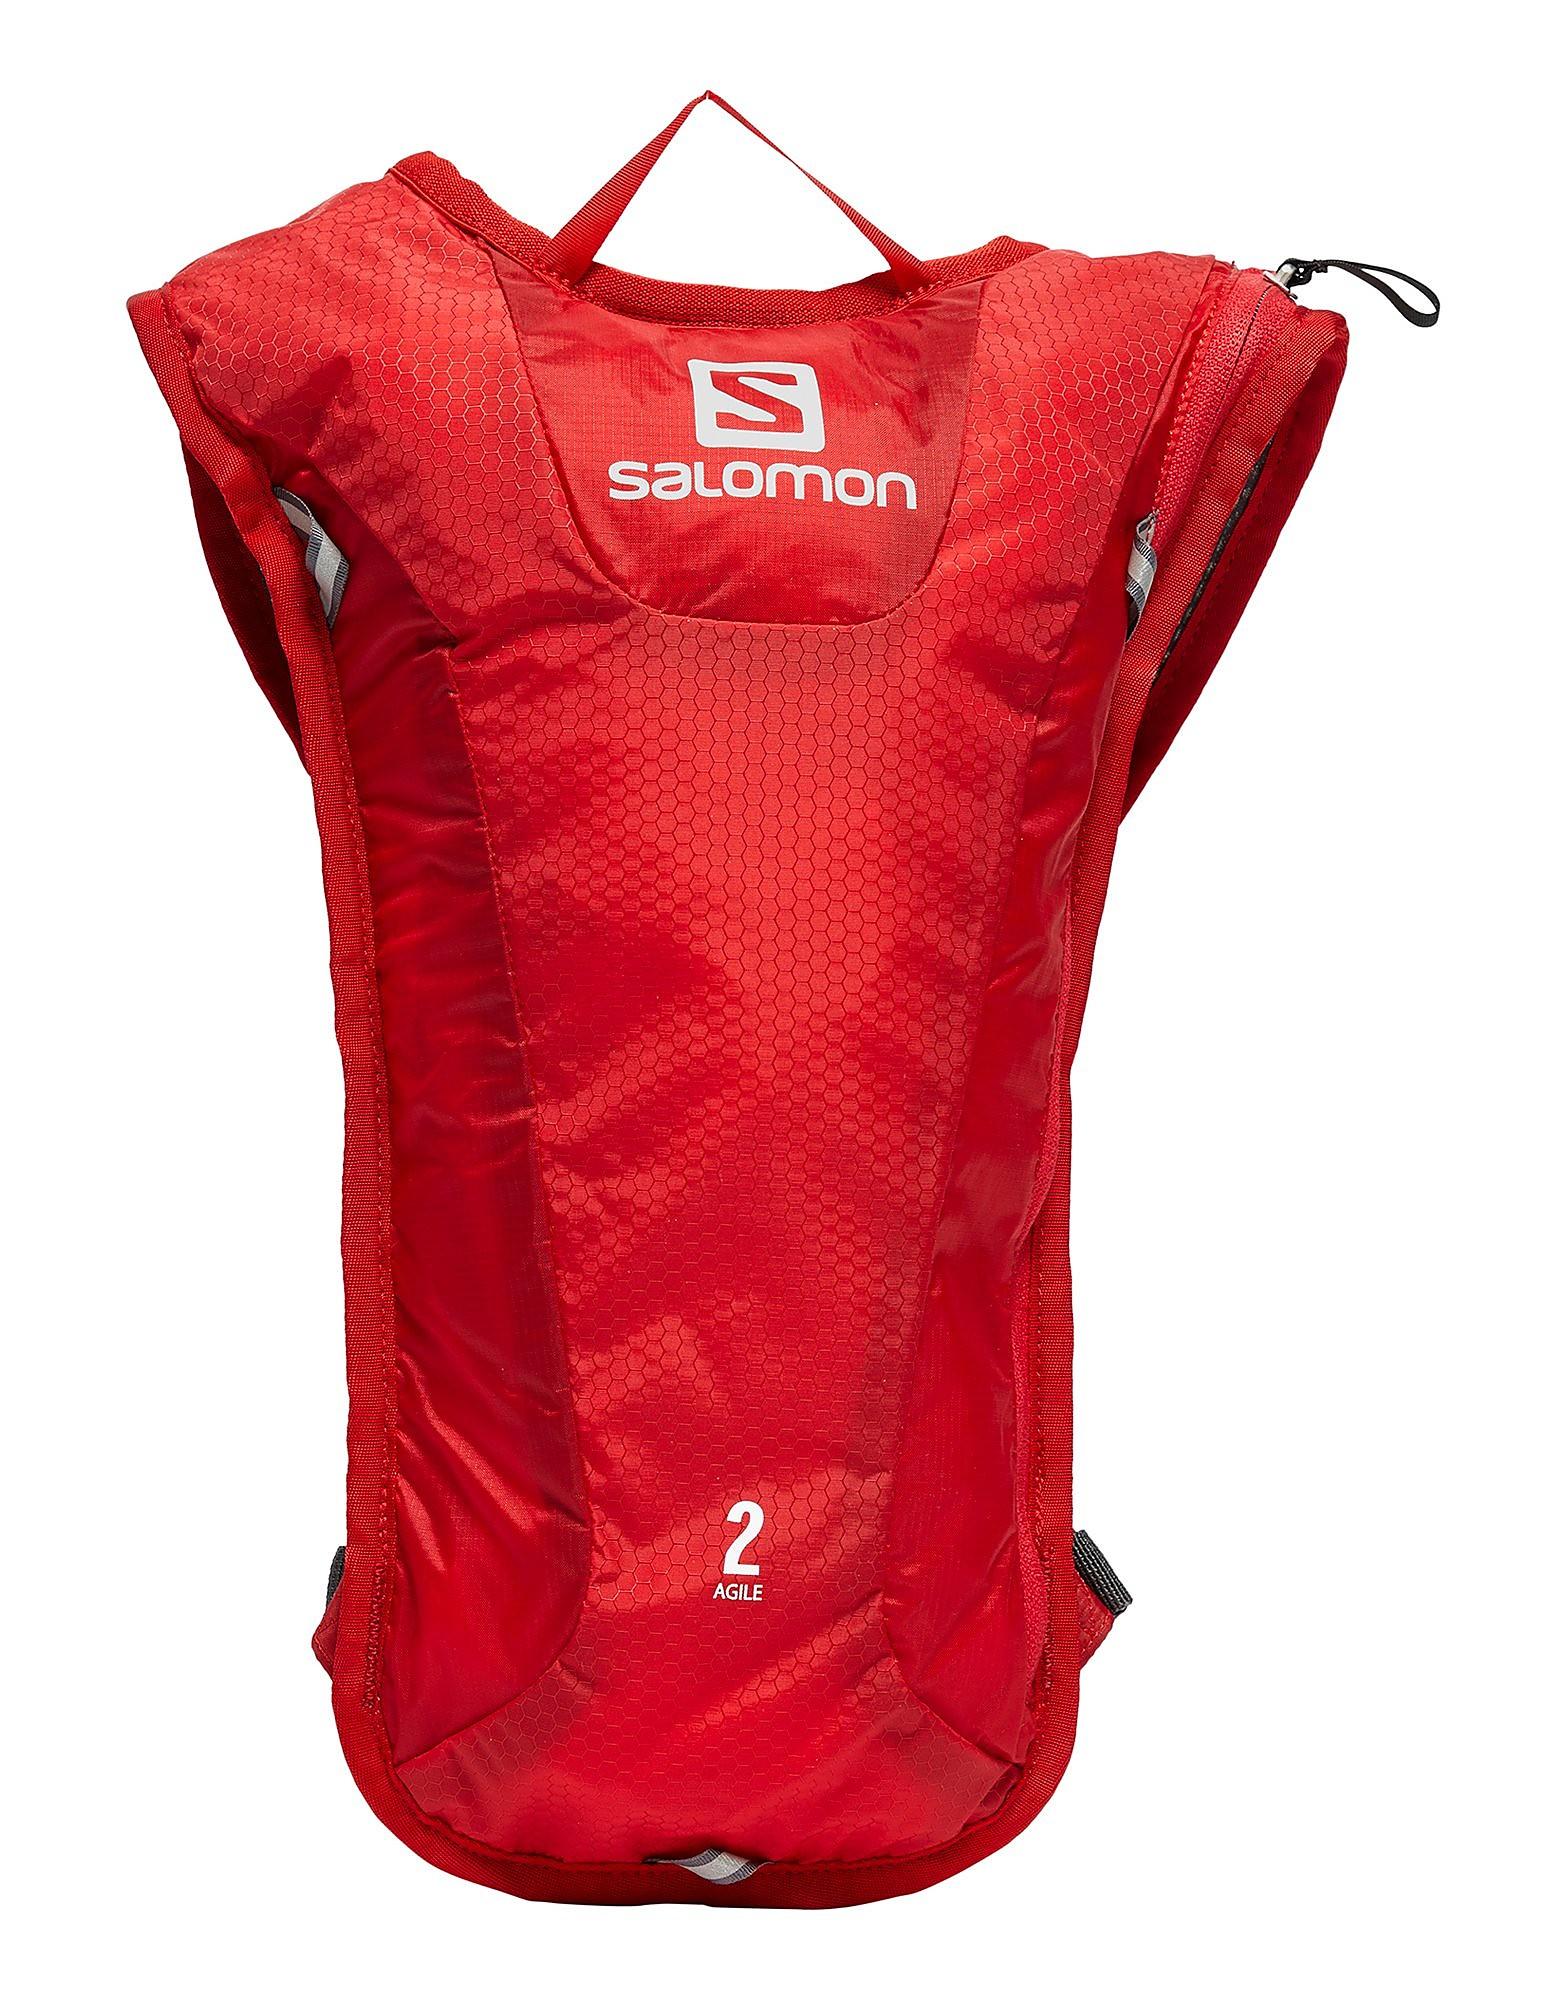 Salomon Agile 2 Set Hydration Pack